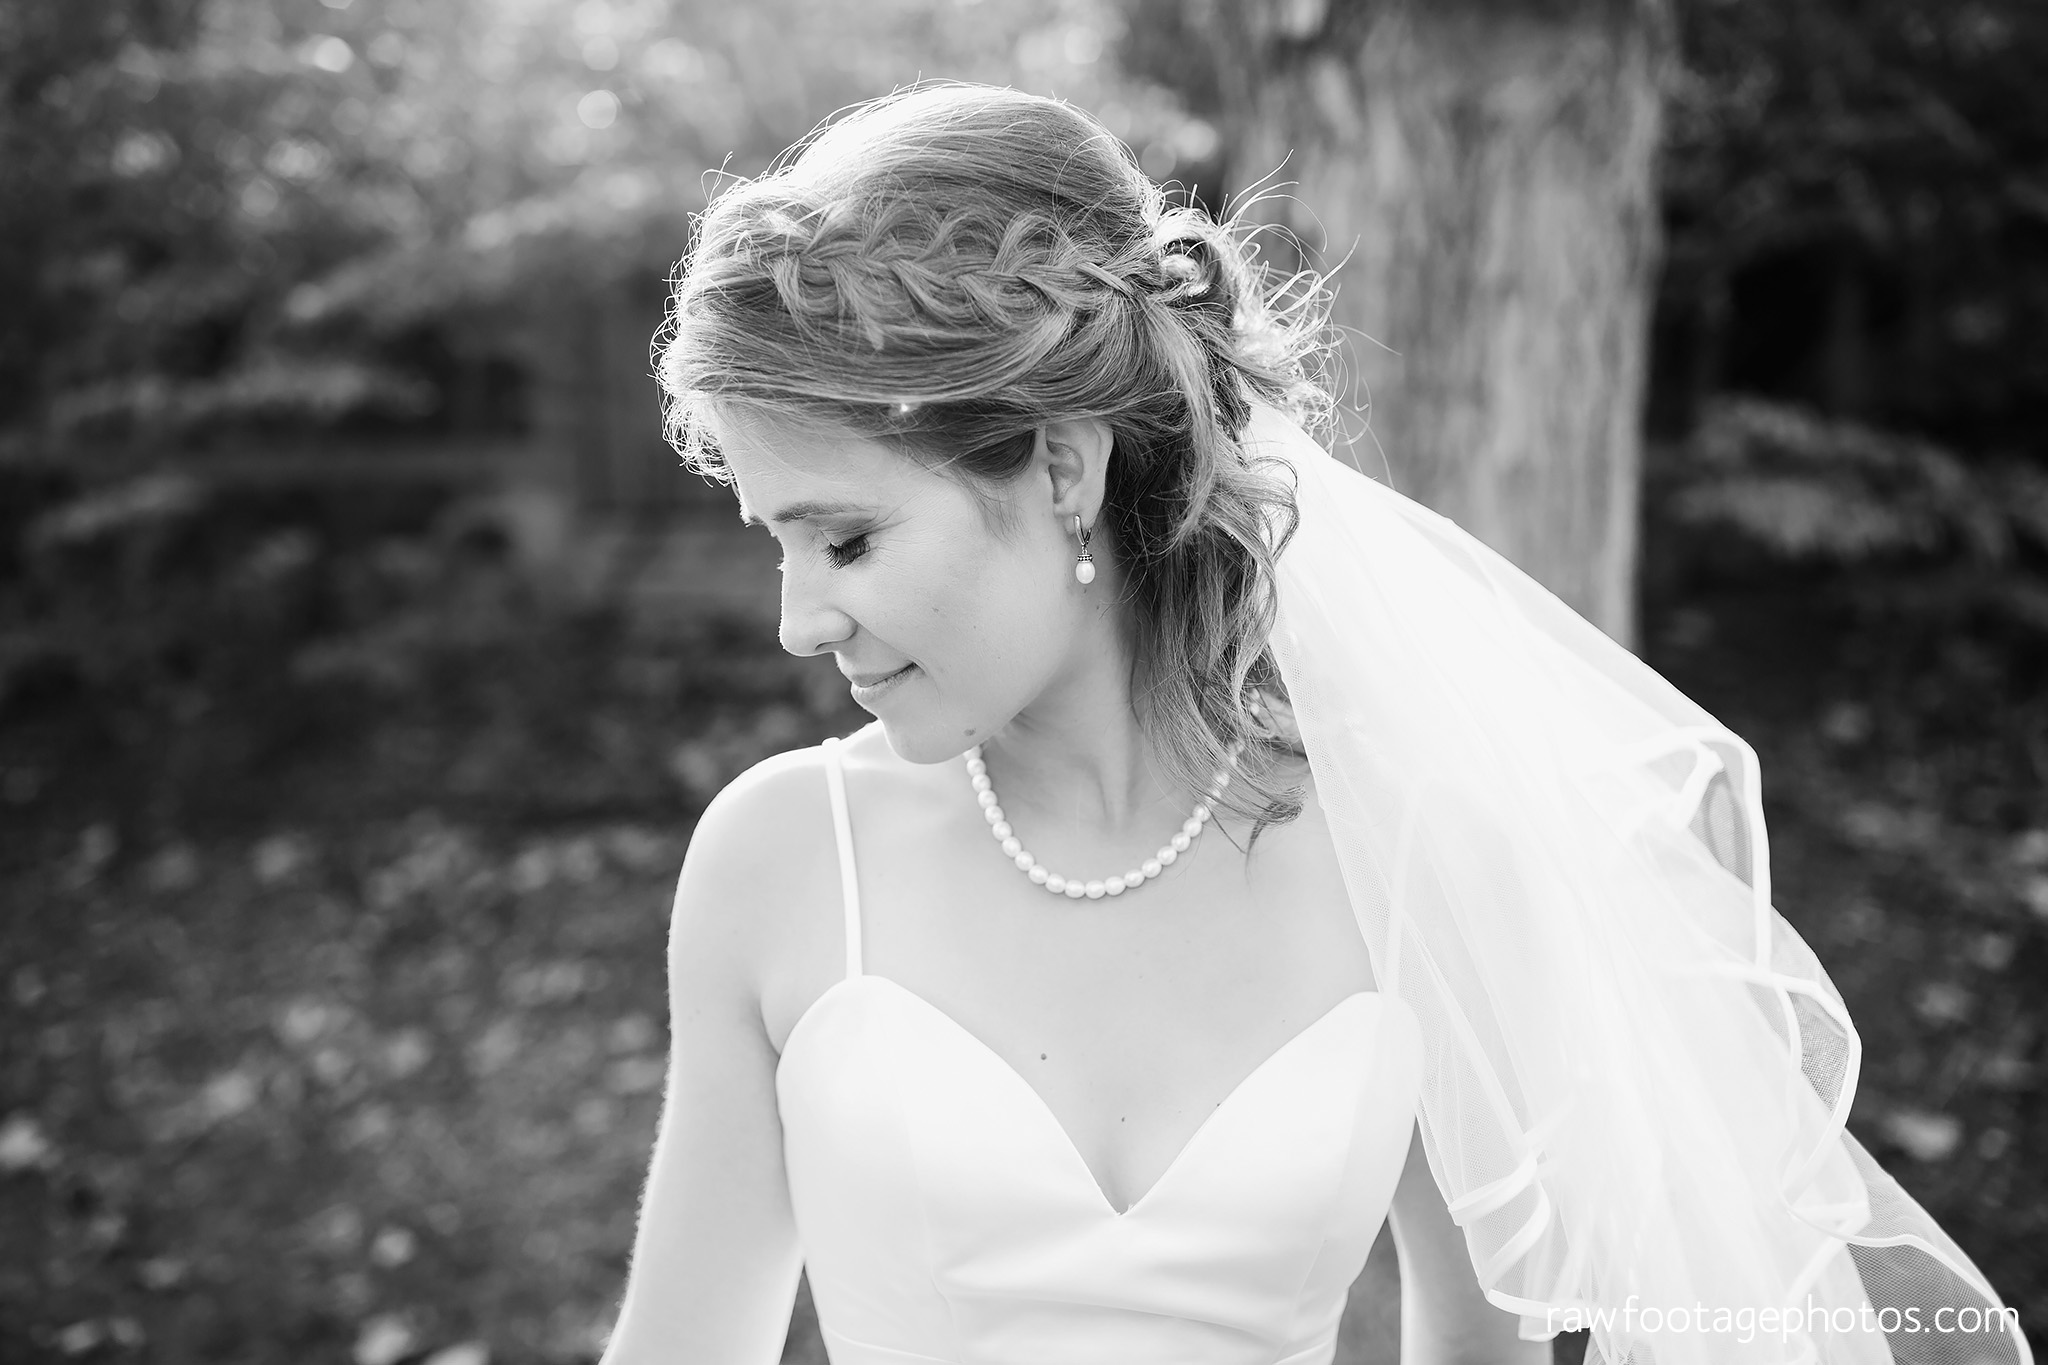 london_ontario_wedding_photographer-civic_gardens-springbank_park-succulent_bouquet-fall_wedding-bridge-raw_footage_photography015.jpg